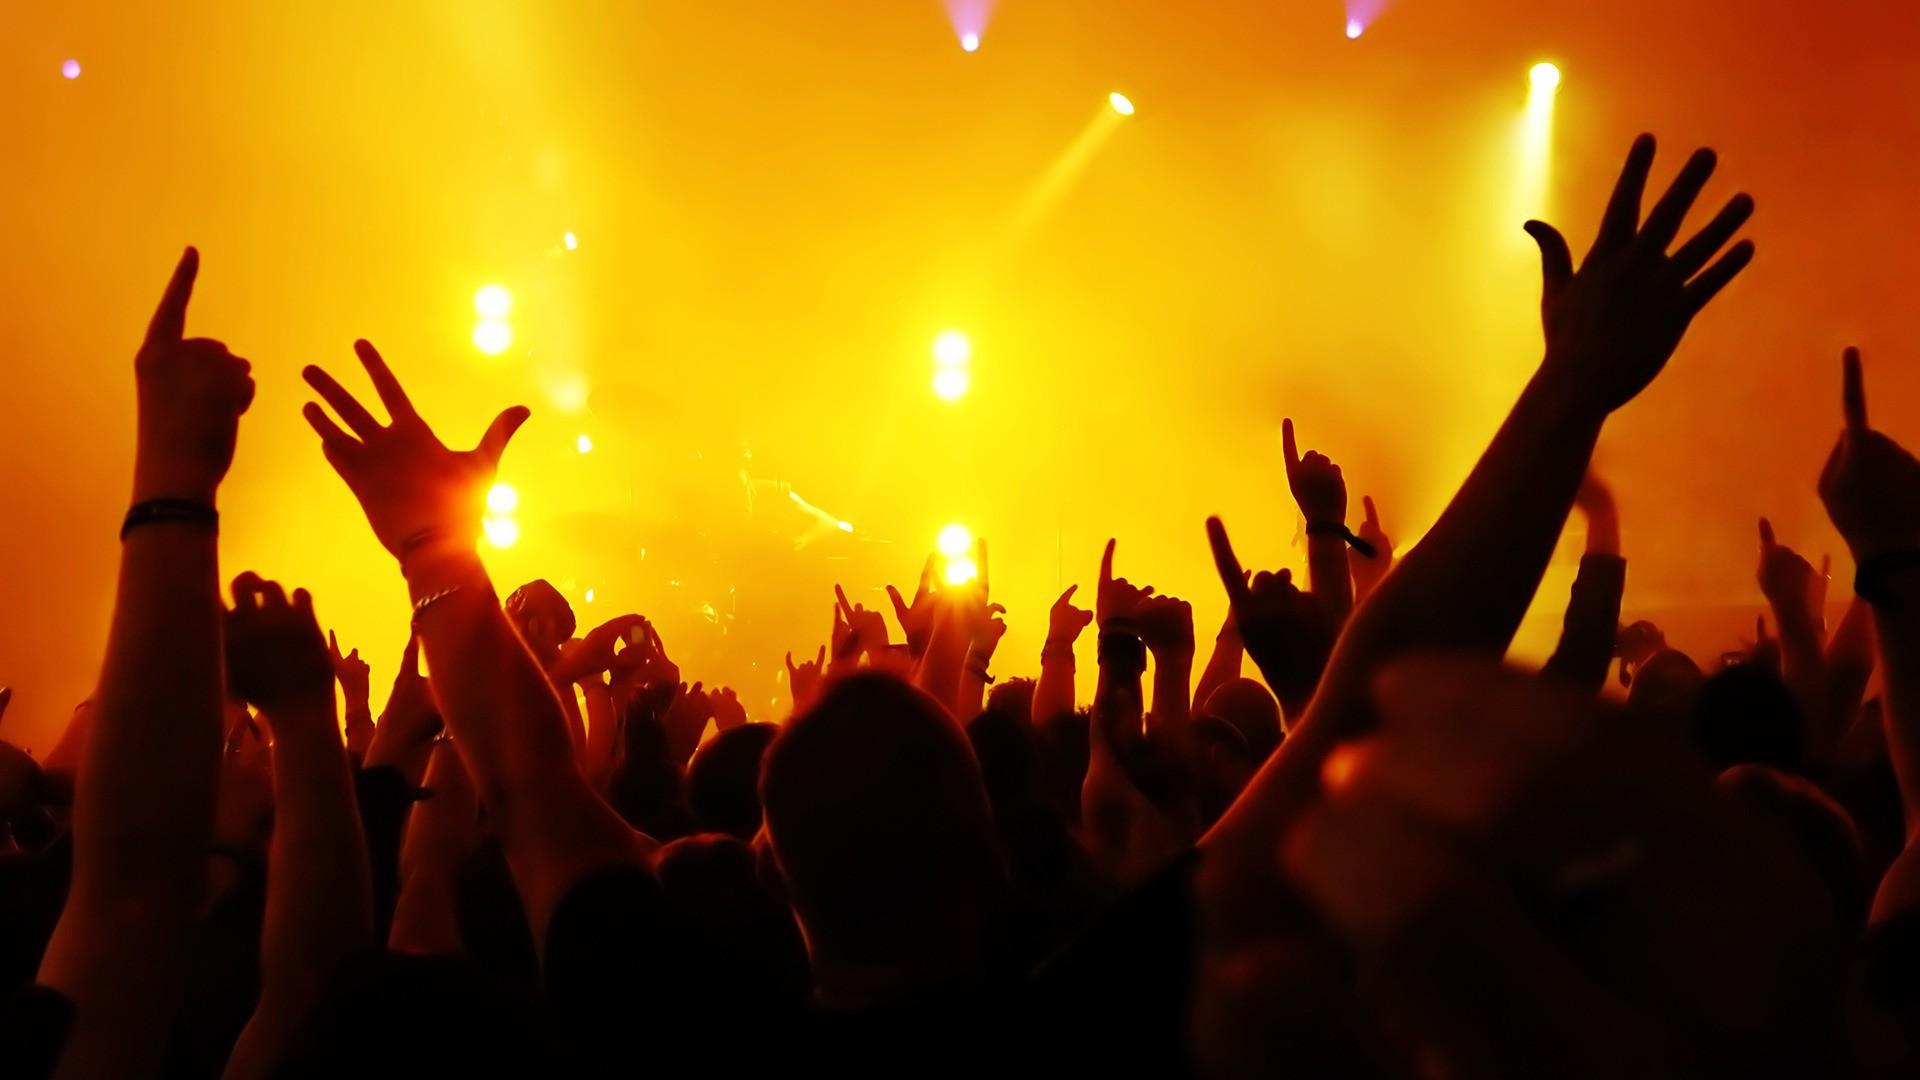 people concert wallpaper 1080p backgrounds concert people 1920x1080